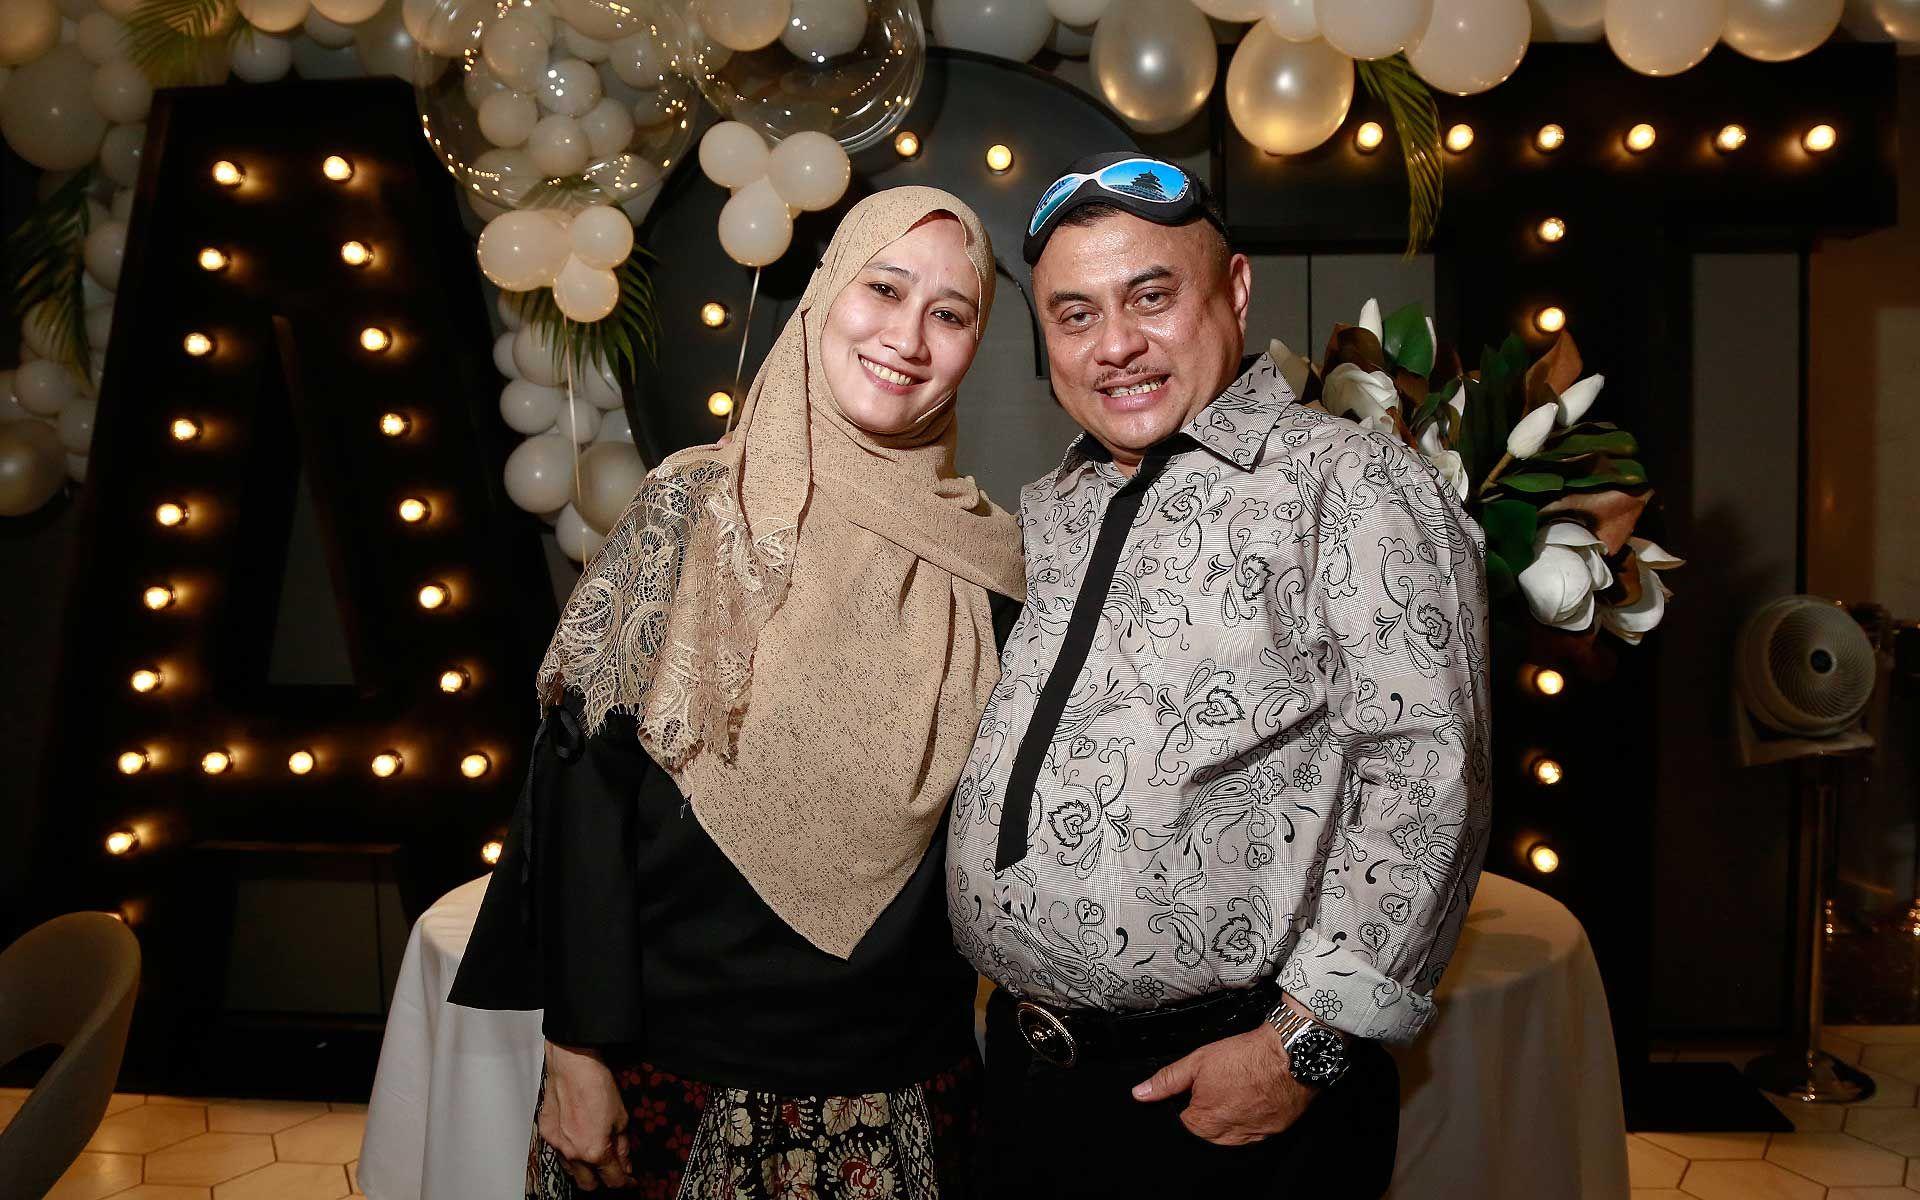 Datin Seri Ila Anhar and Datuk Seri Chairul Anhar